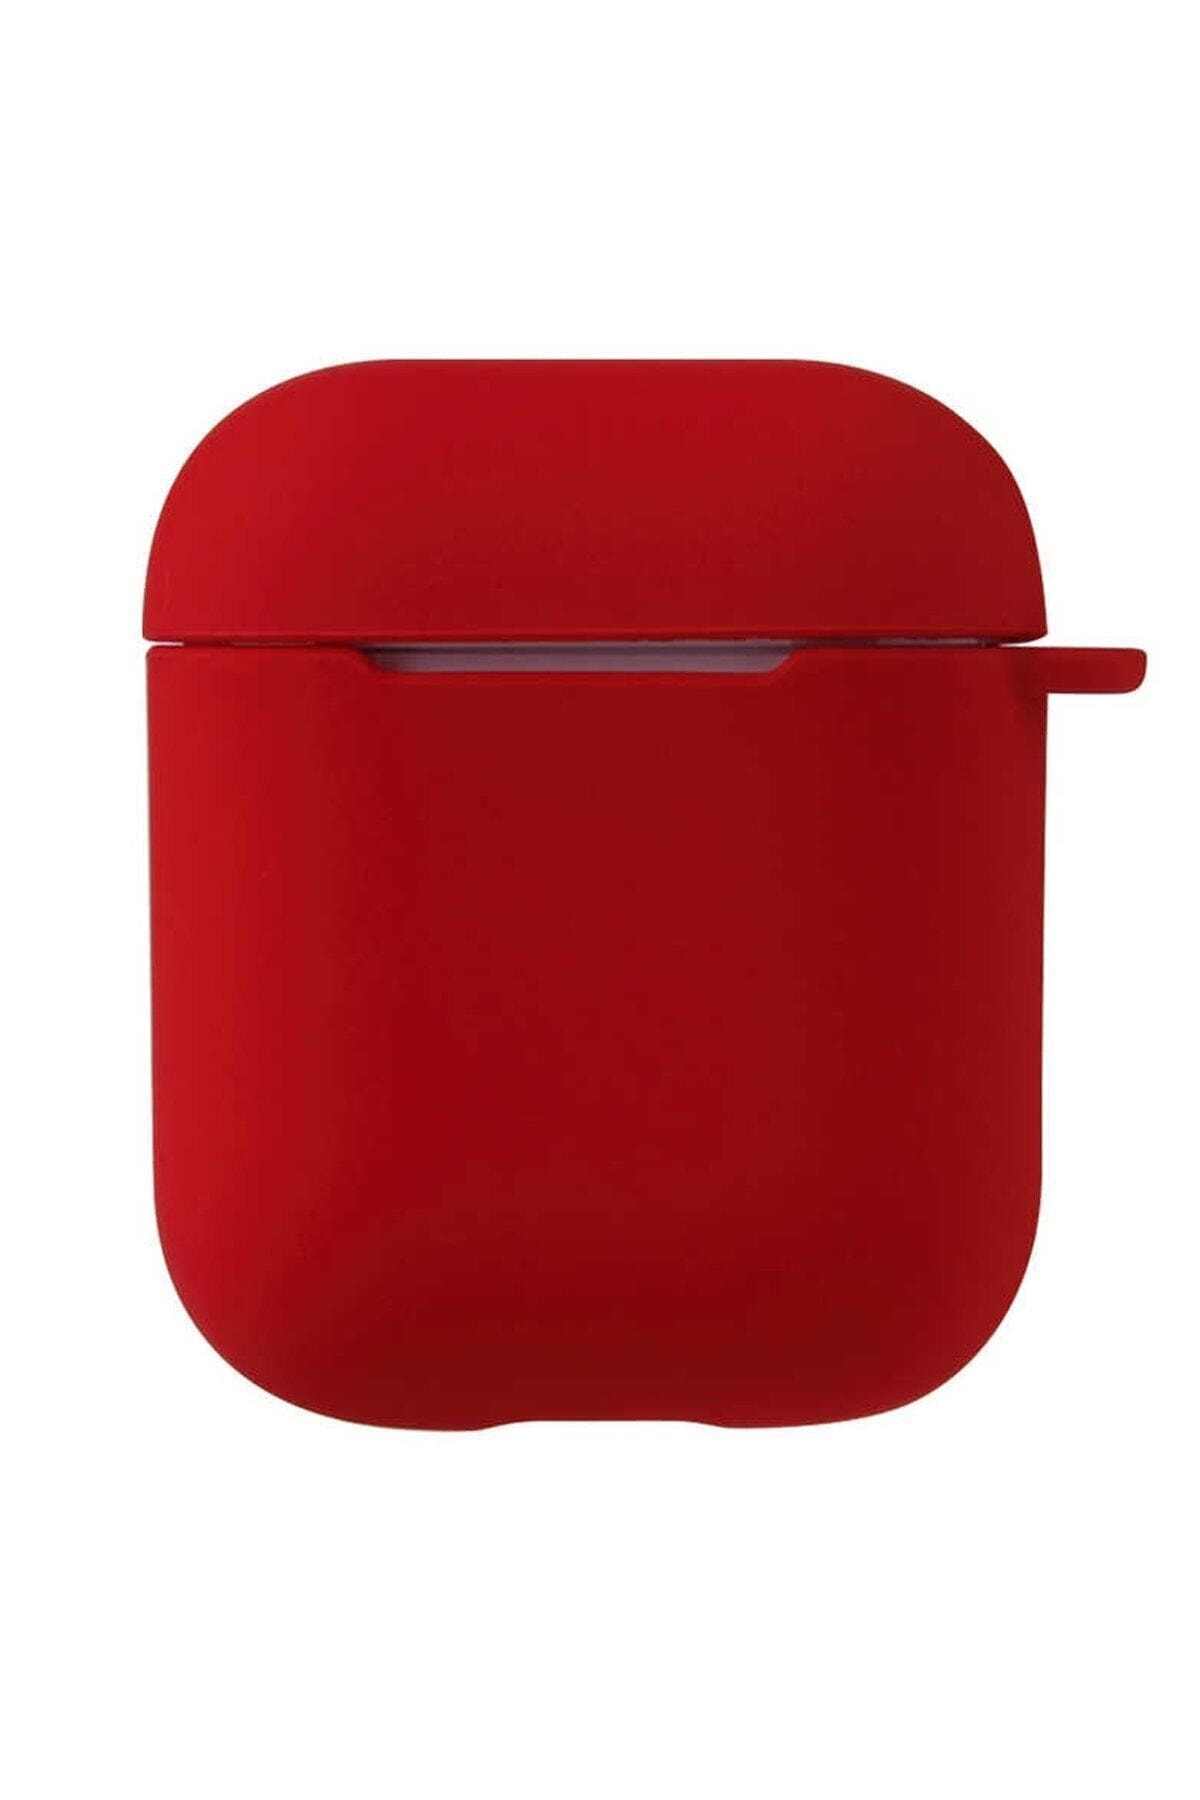 Sunix Airpods 2. Nesil Kılıf Pastel Renkli Silikon Koruma Kopçalı 1